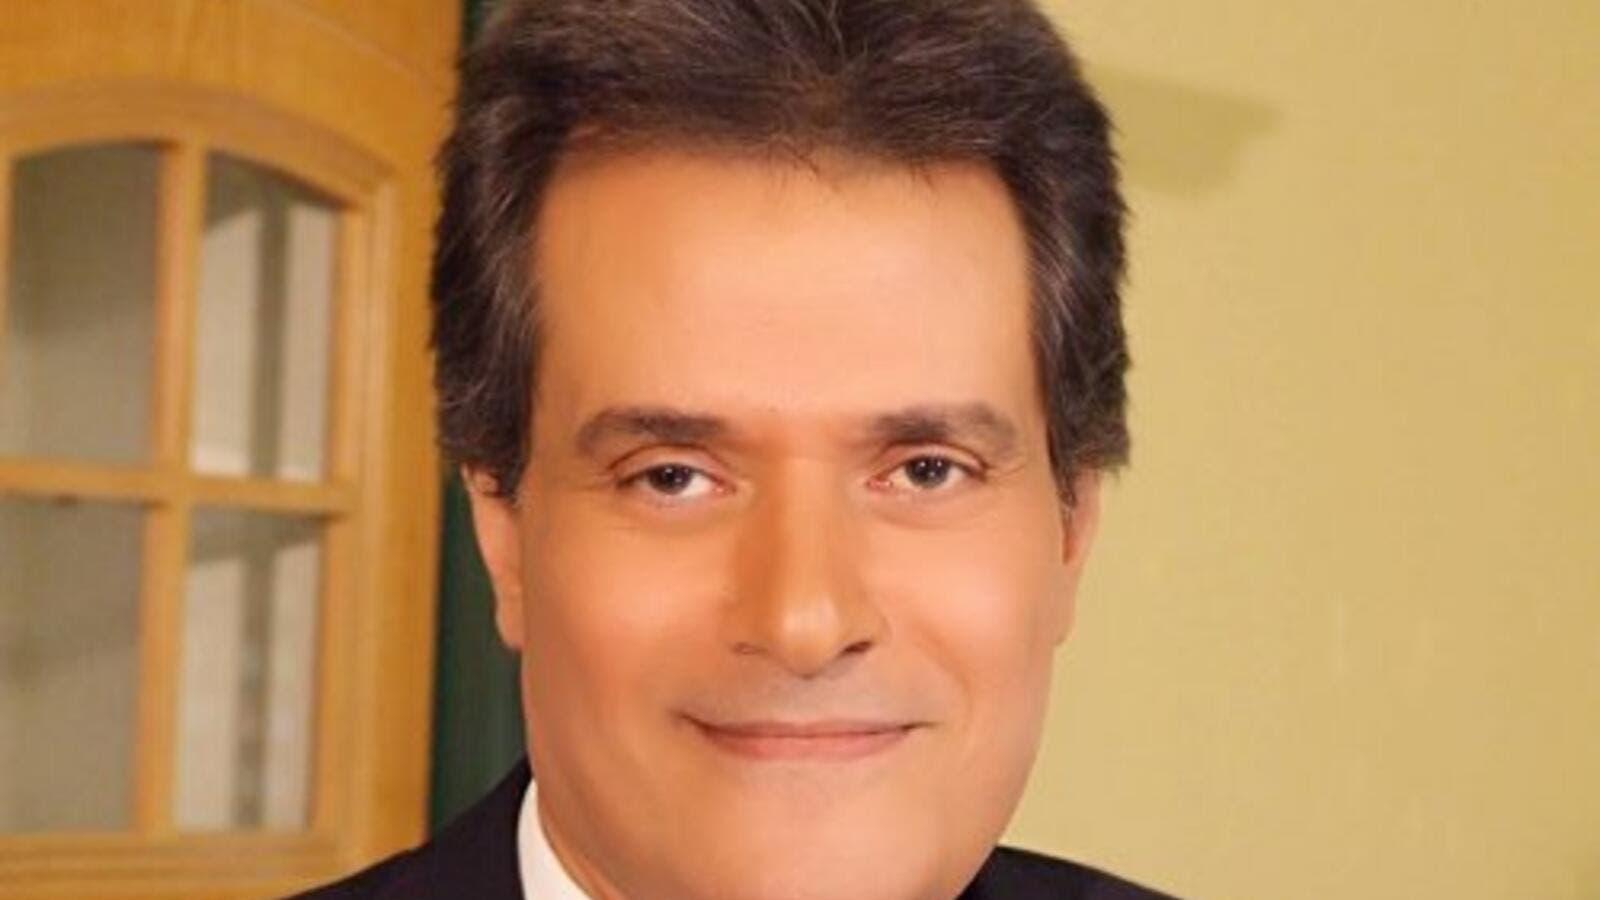 Egyptian actor Ibrahim Yusri sadly (and ironically) dies on